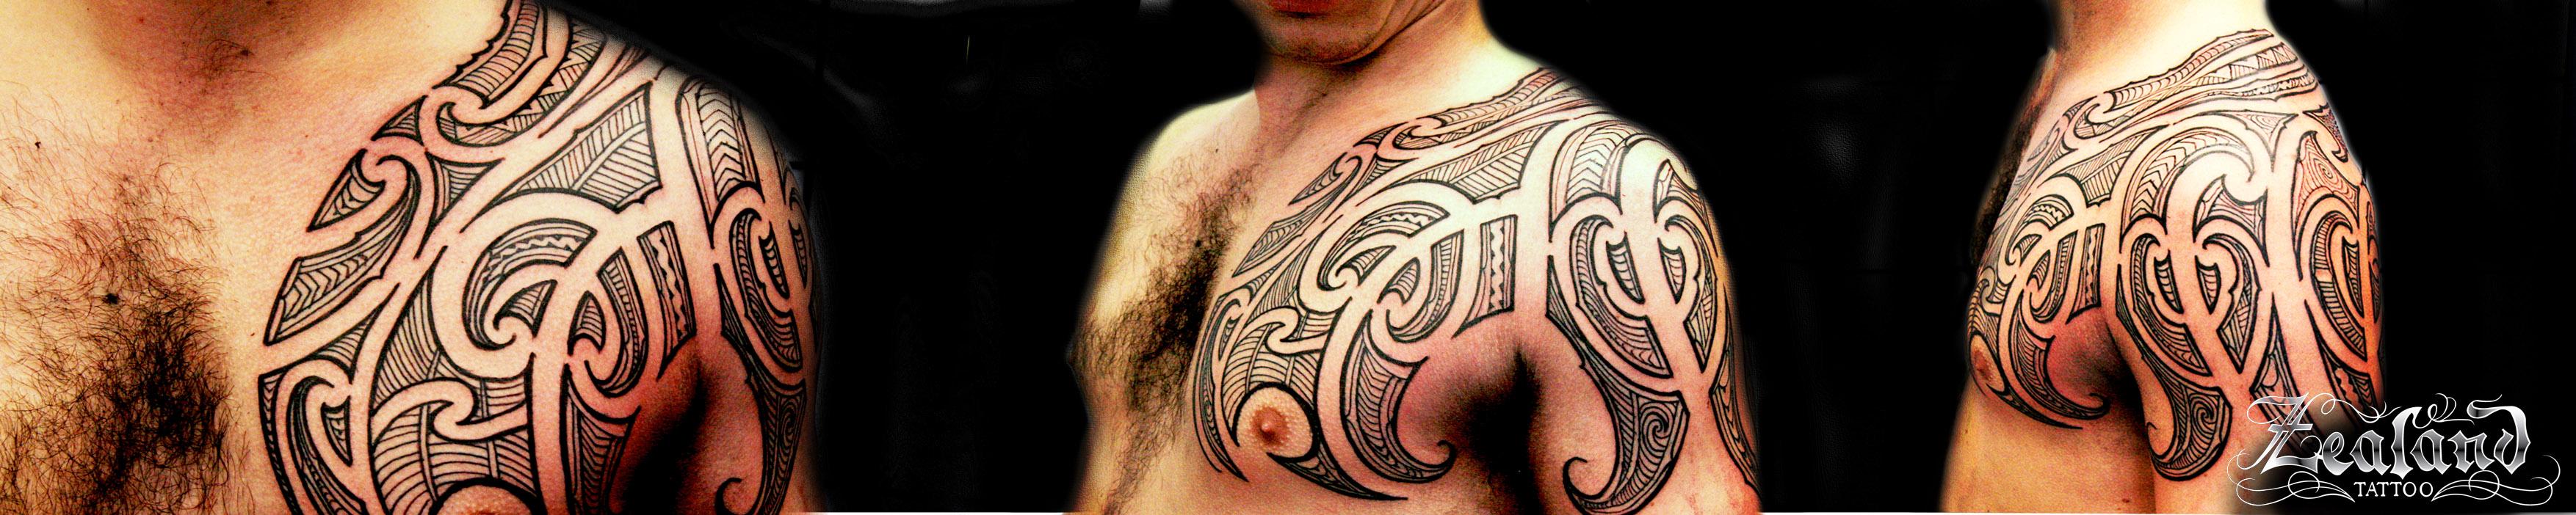 The World Of Maori Tattoo: Maori Tattoo In NZ And Internationally